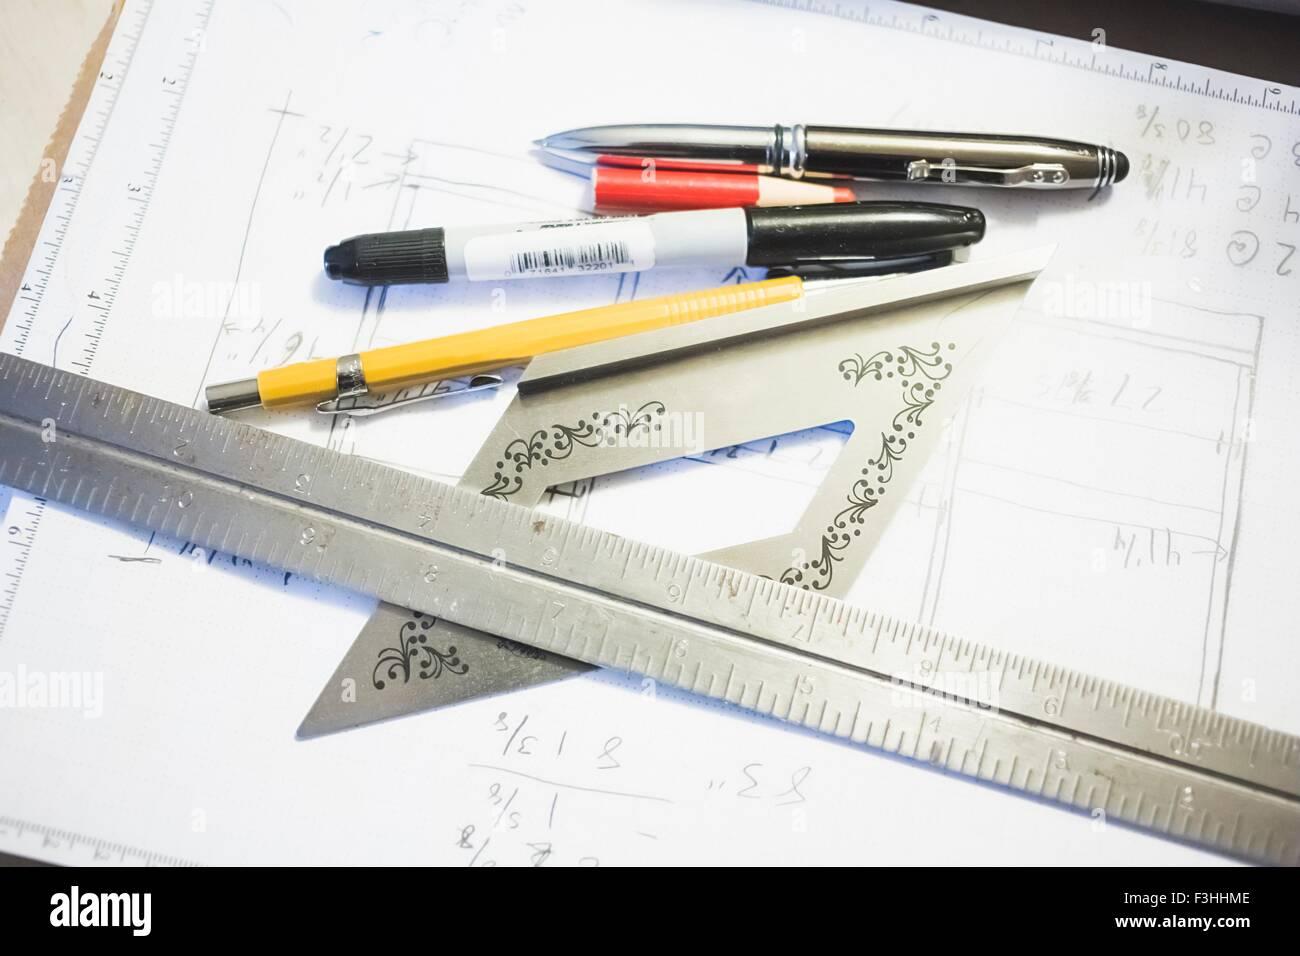 High angle view of stationary and metal ruler on blueprint - Stock Image